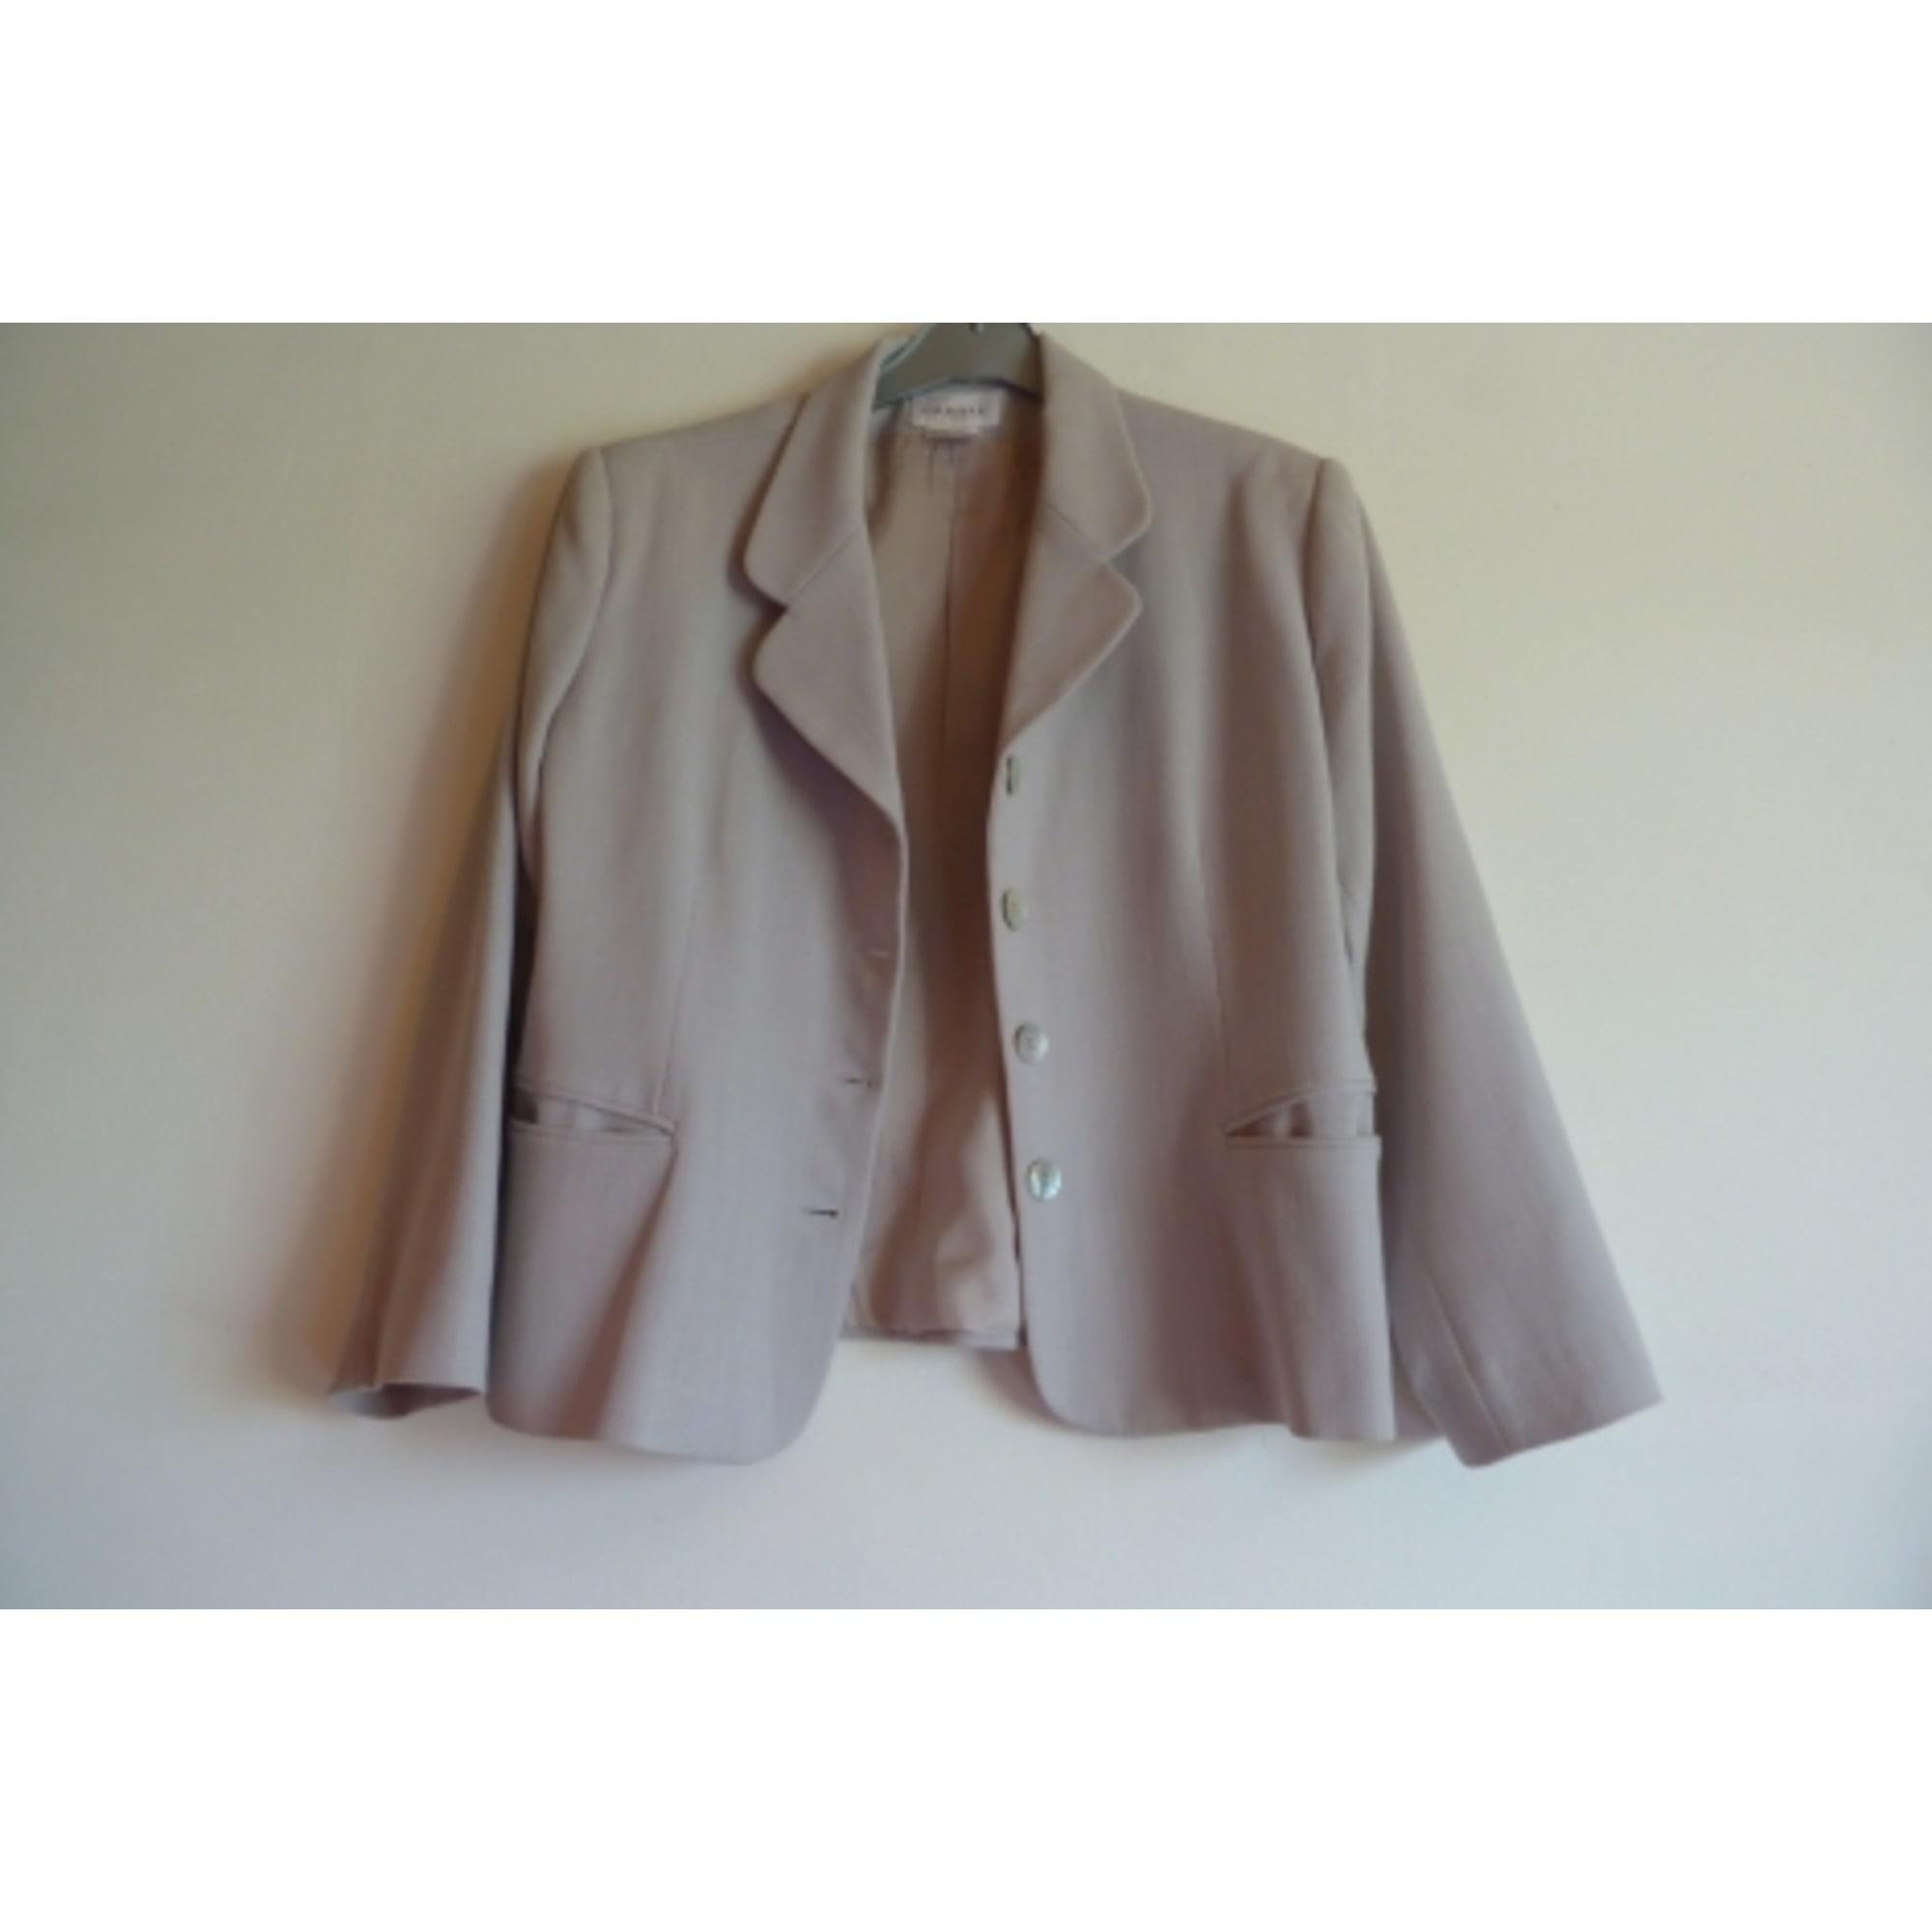 1f8abab7d94 Tailleur pantalon CAROLL PARIS 40 (L